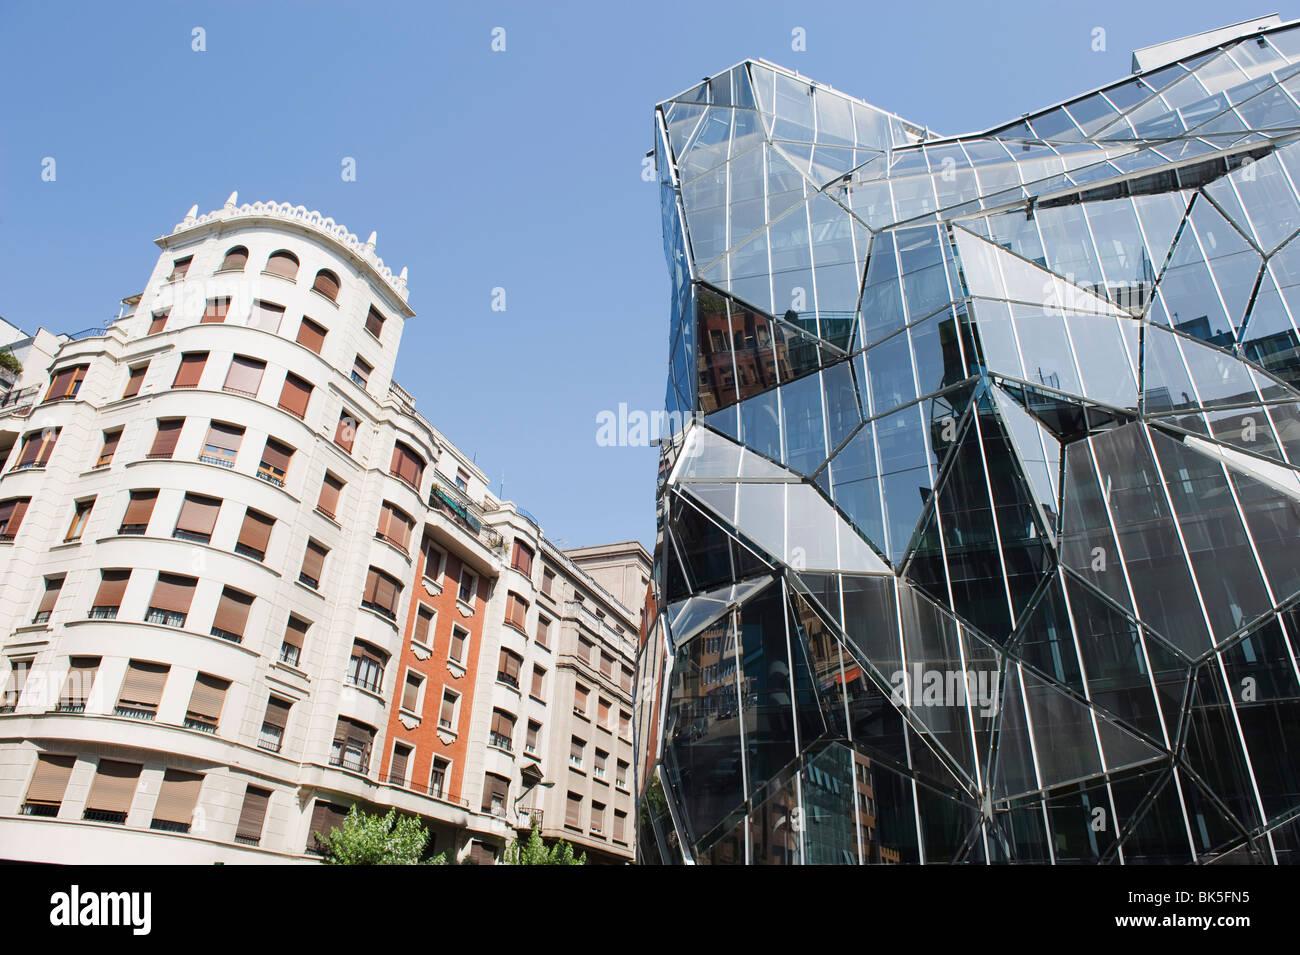 La arquitectura moderna del Departamento de Salud, Bilbao, País Vasco, España, Europa Imagen De Stock